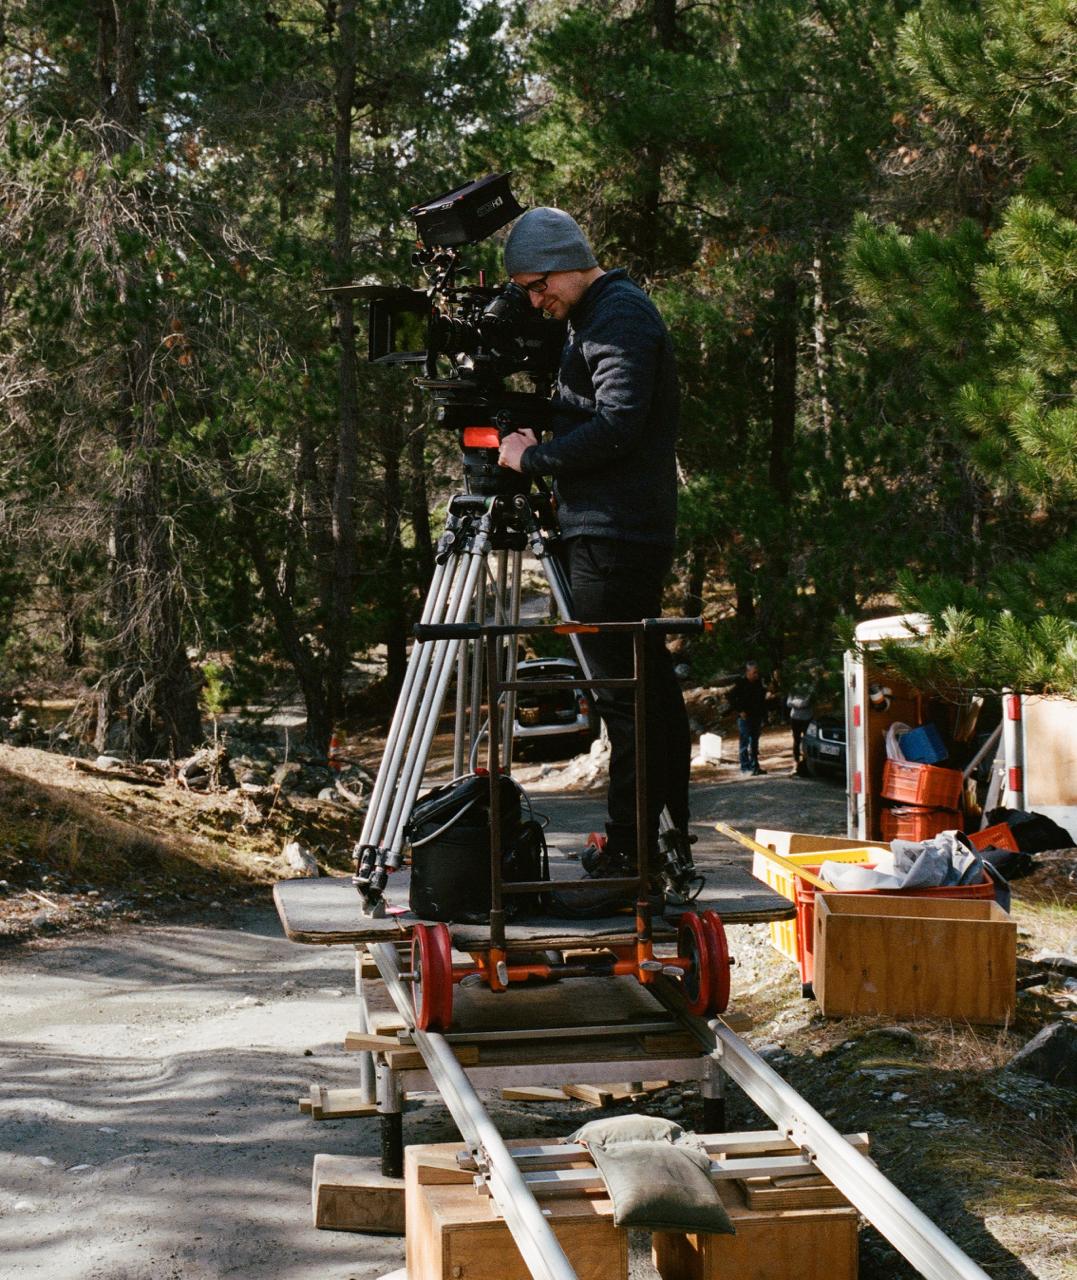 Director Dustin Feneley